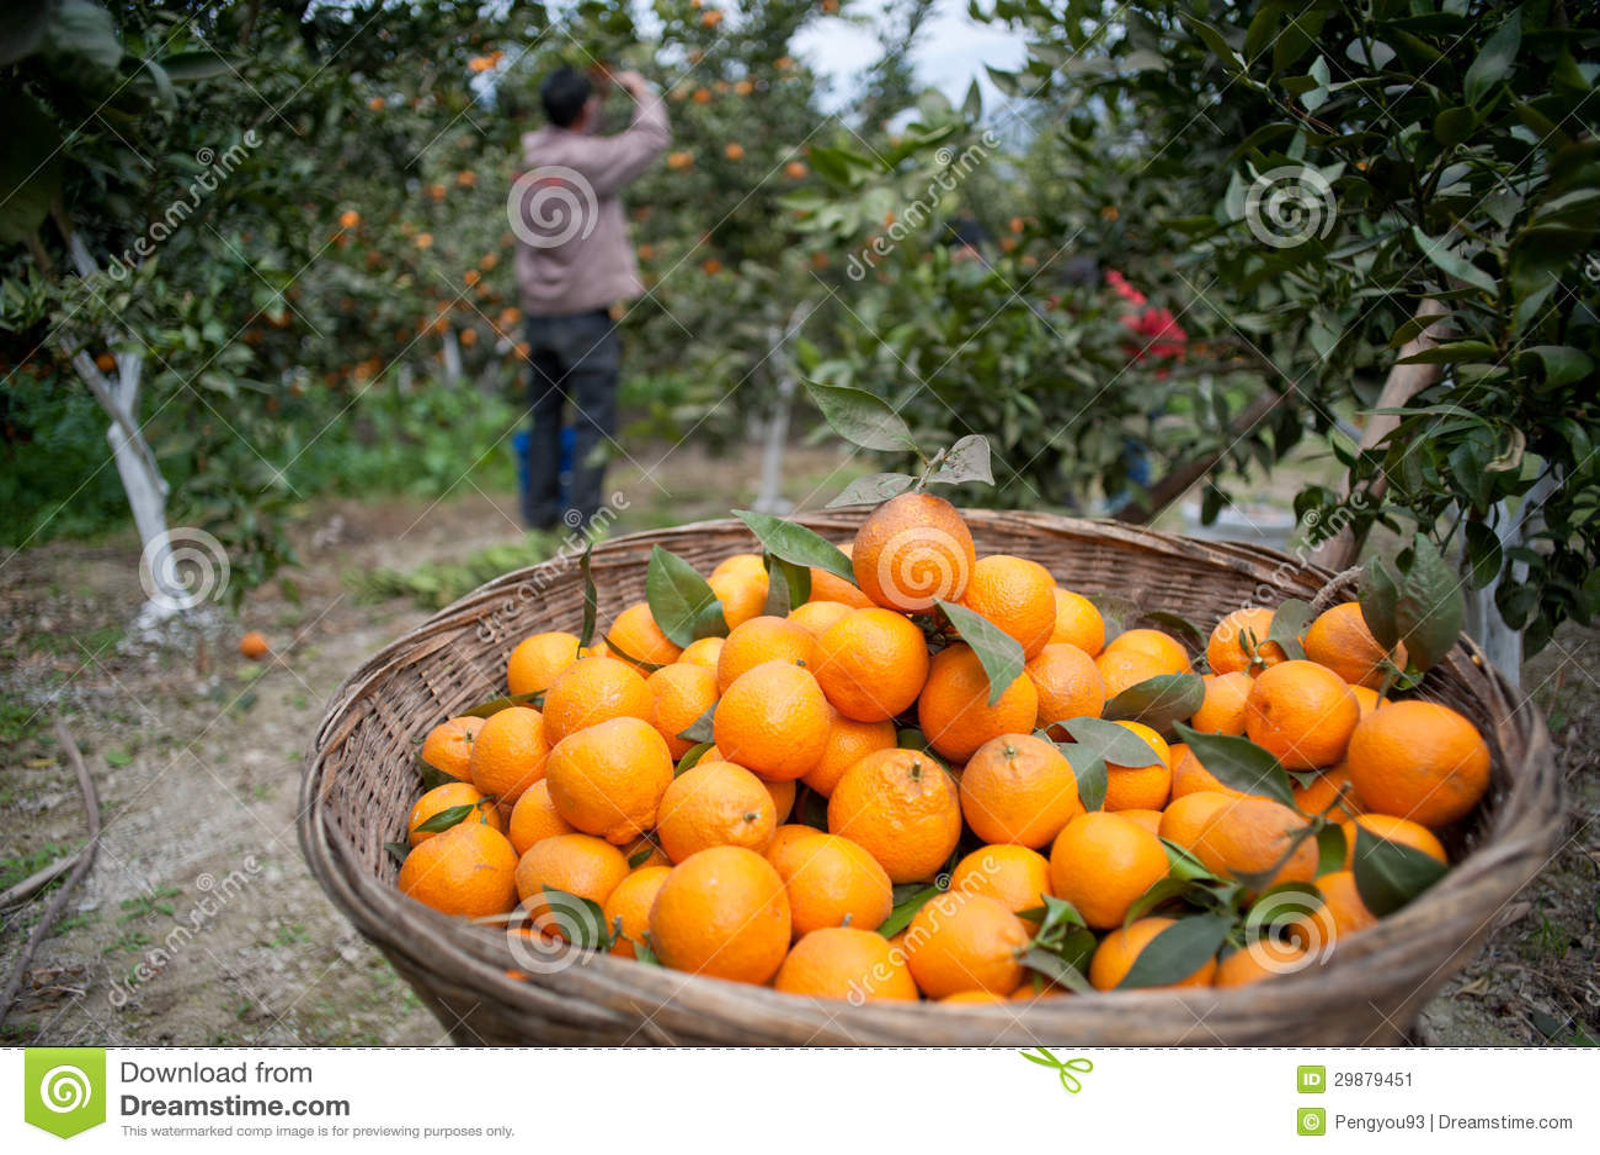 arbres fruitiers jardins arbre orange image stock image du cl mentine tangelo 29879451. Black Bedroom Furniture Sets. Home Design Ideas